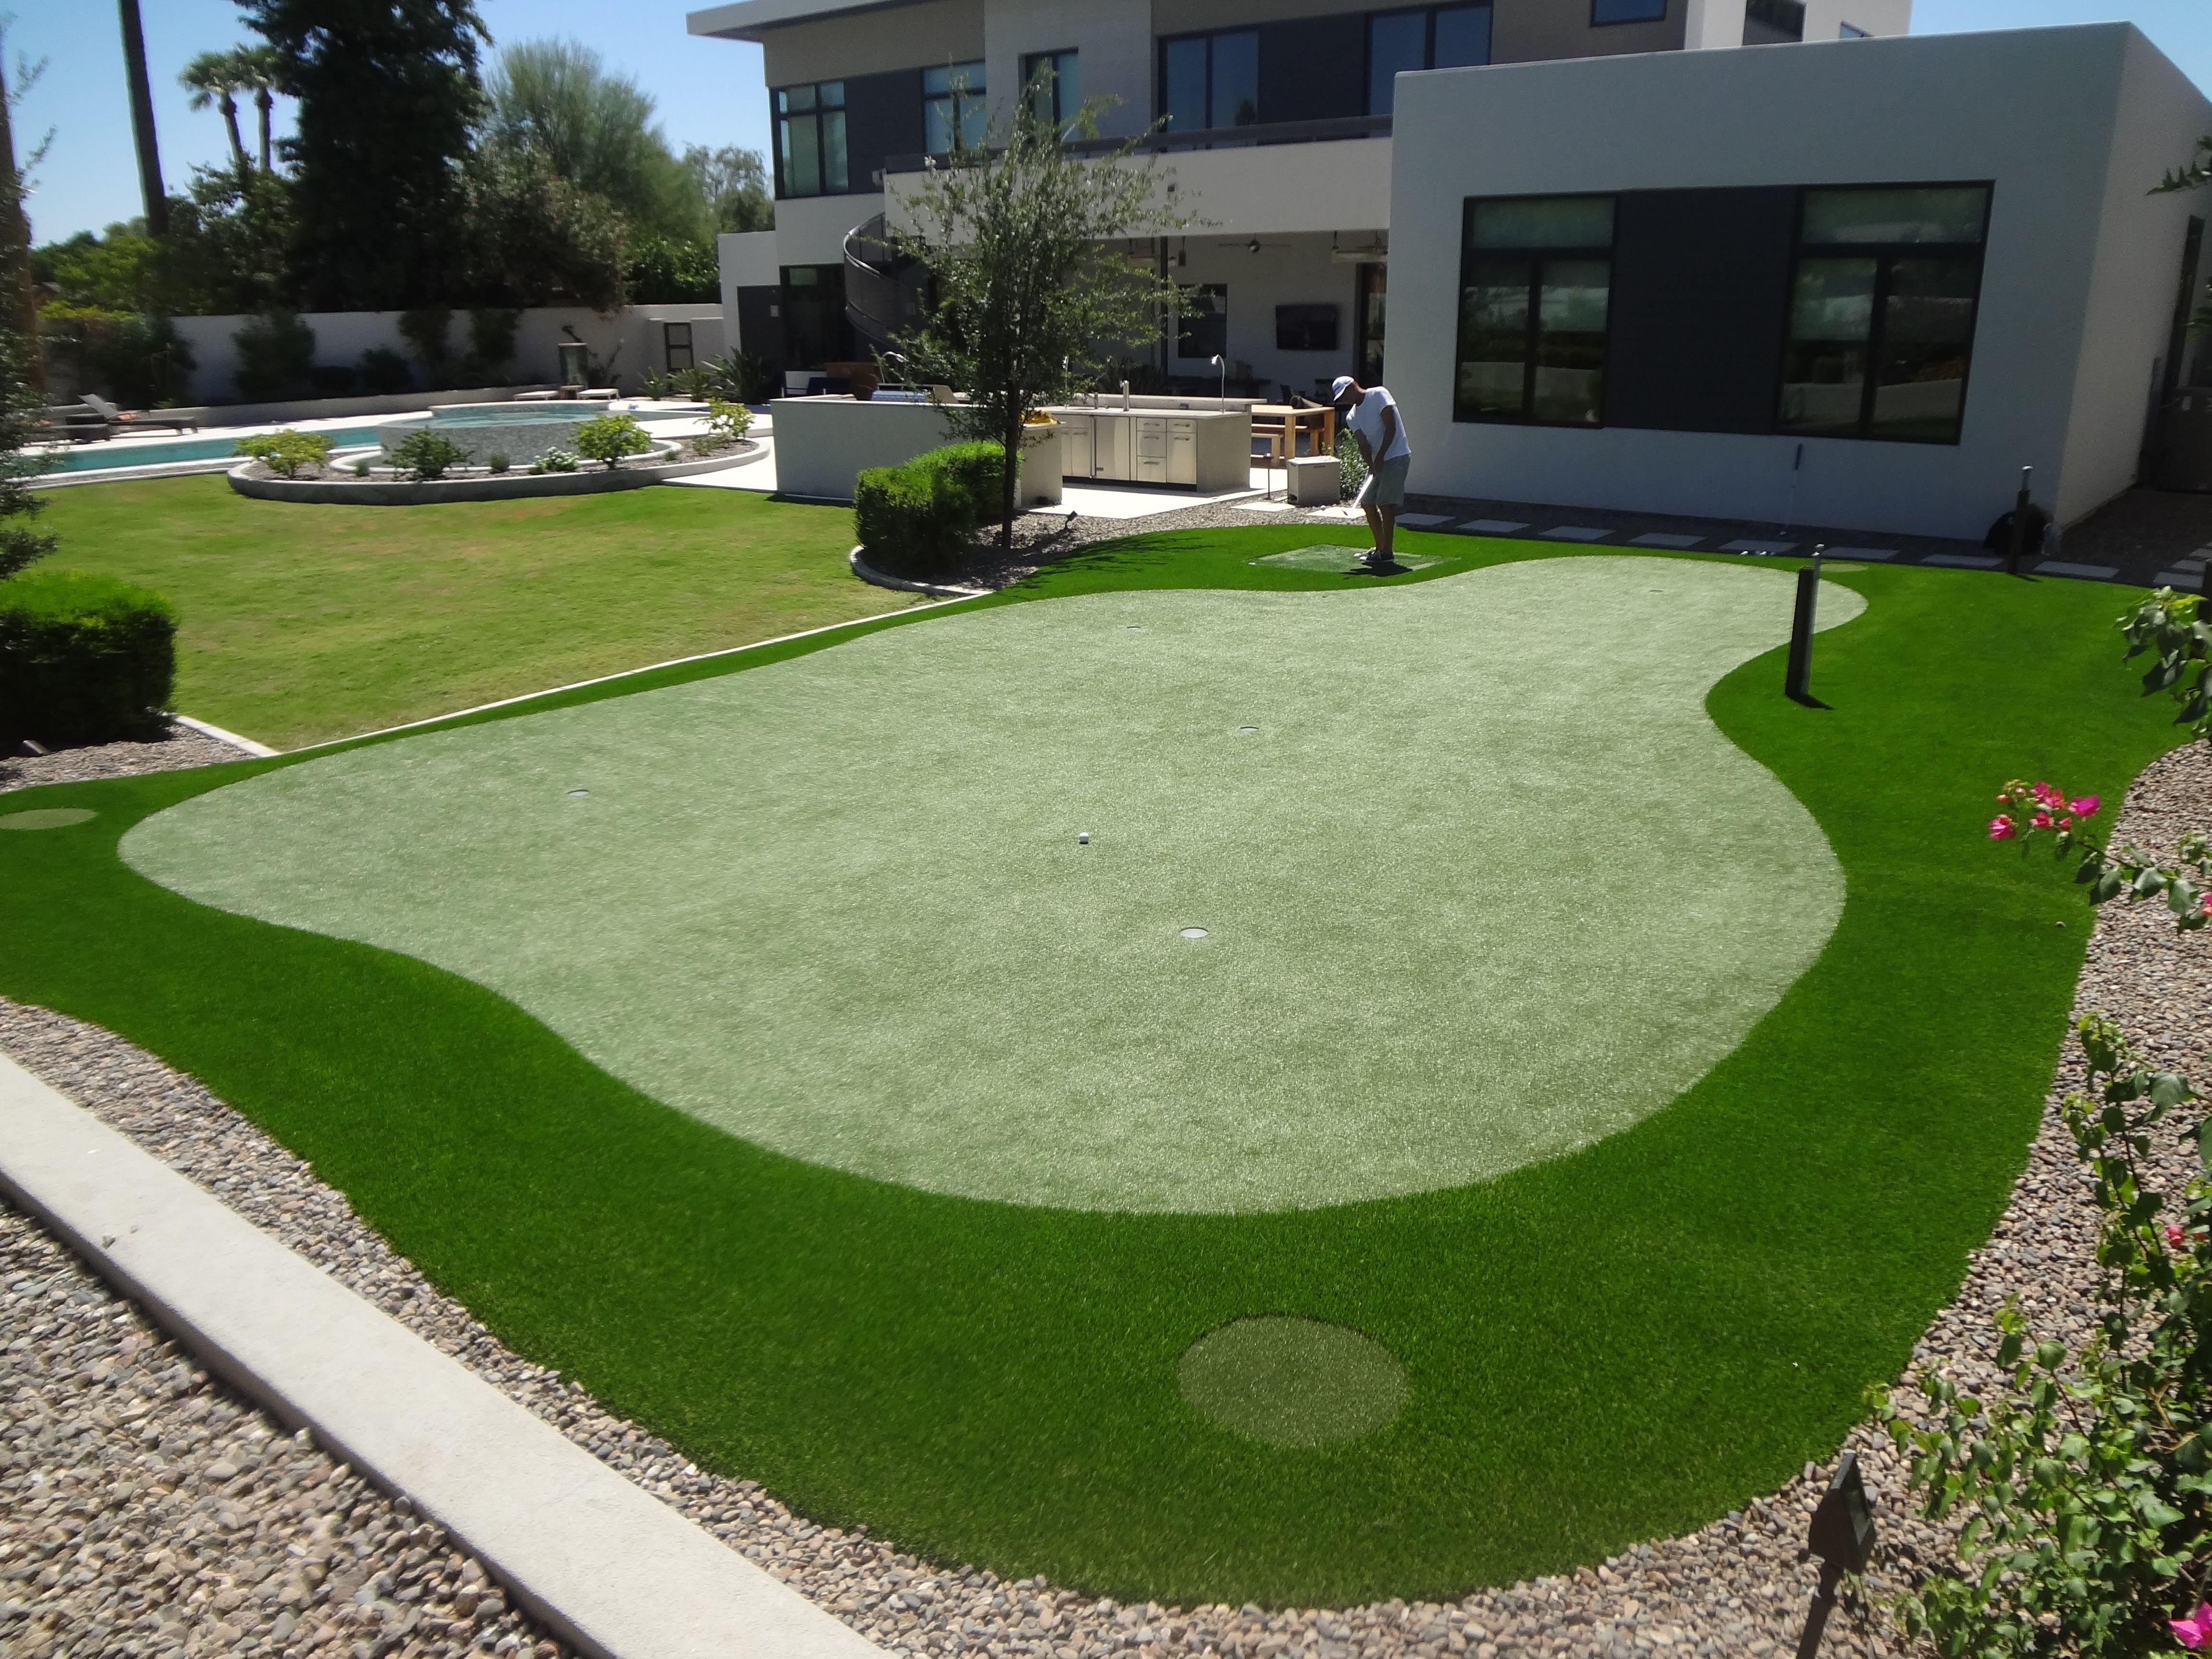 Backyard Putting Greens | Backyard putting green, Putting ...